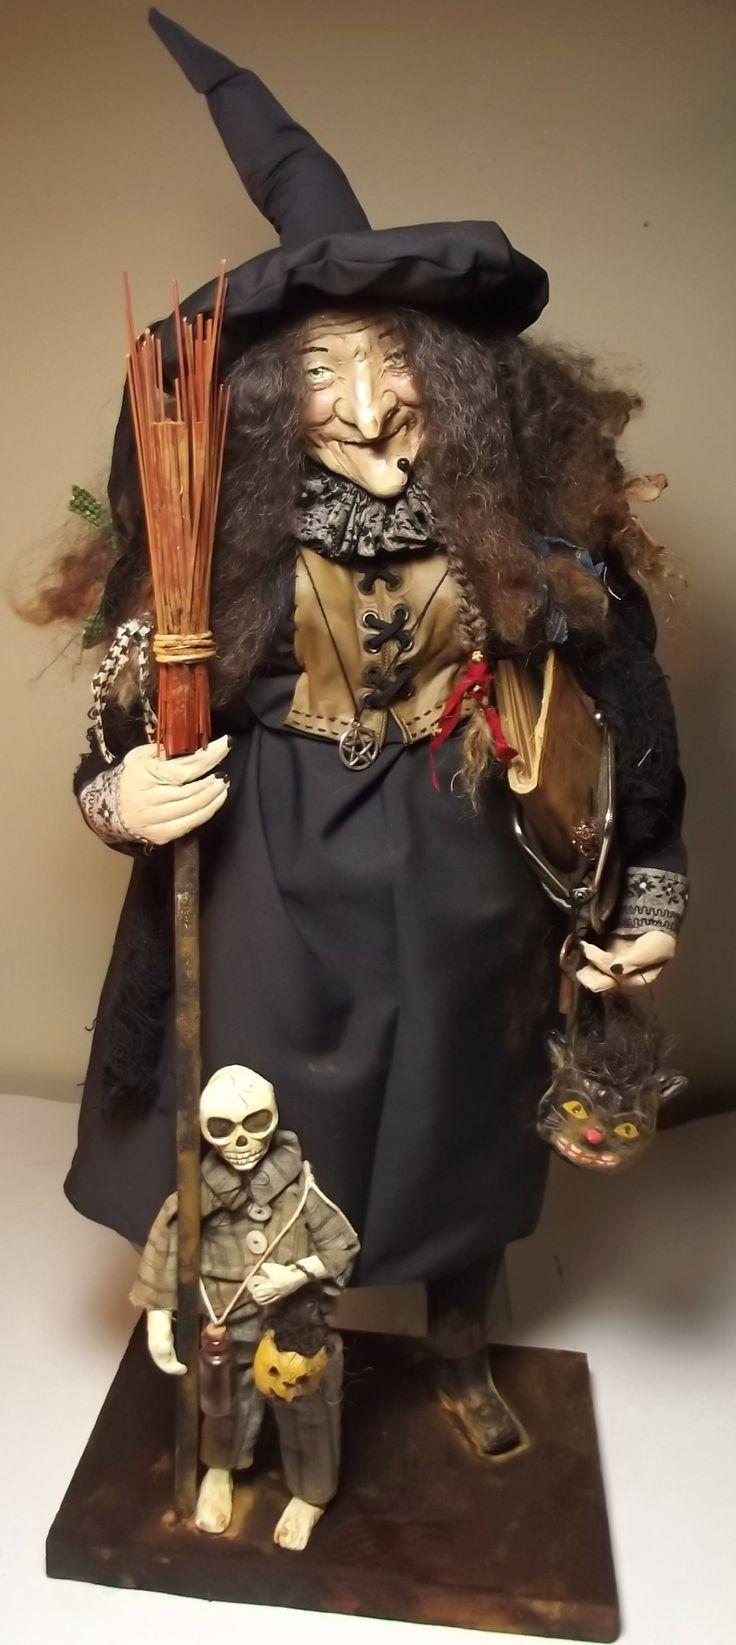 Handmade OoAk Witch & Skeleton Guy By Kim Sweet~Kim's Klaus~Vintage AntiQue Halloween